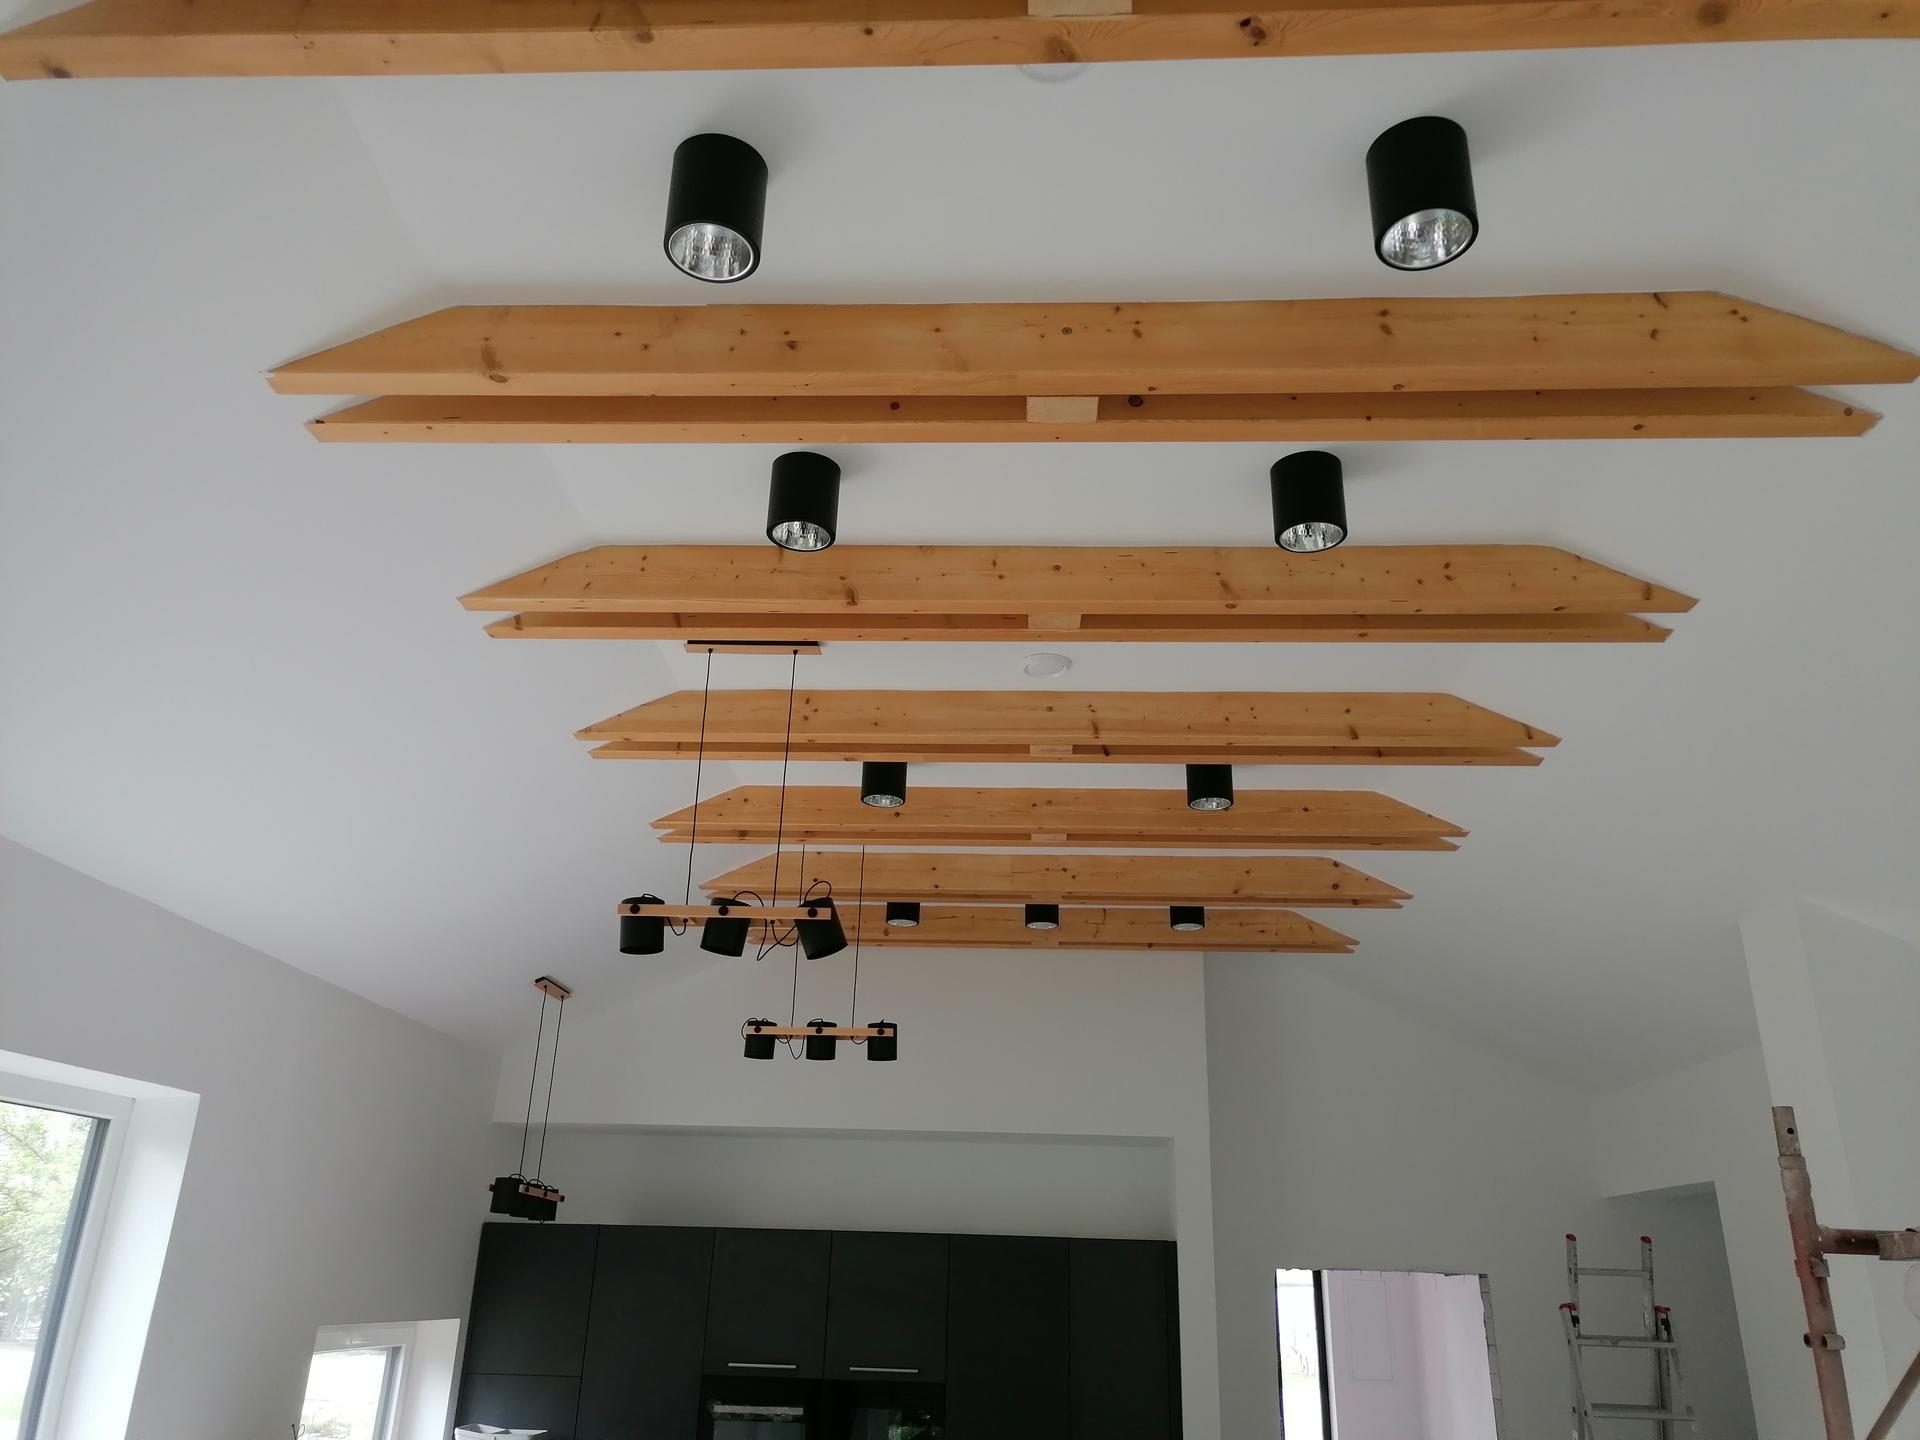 Naše Lko - Svetla v obv a kuchyni.